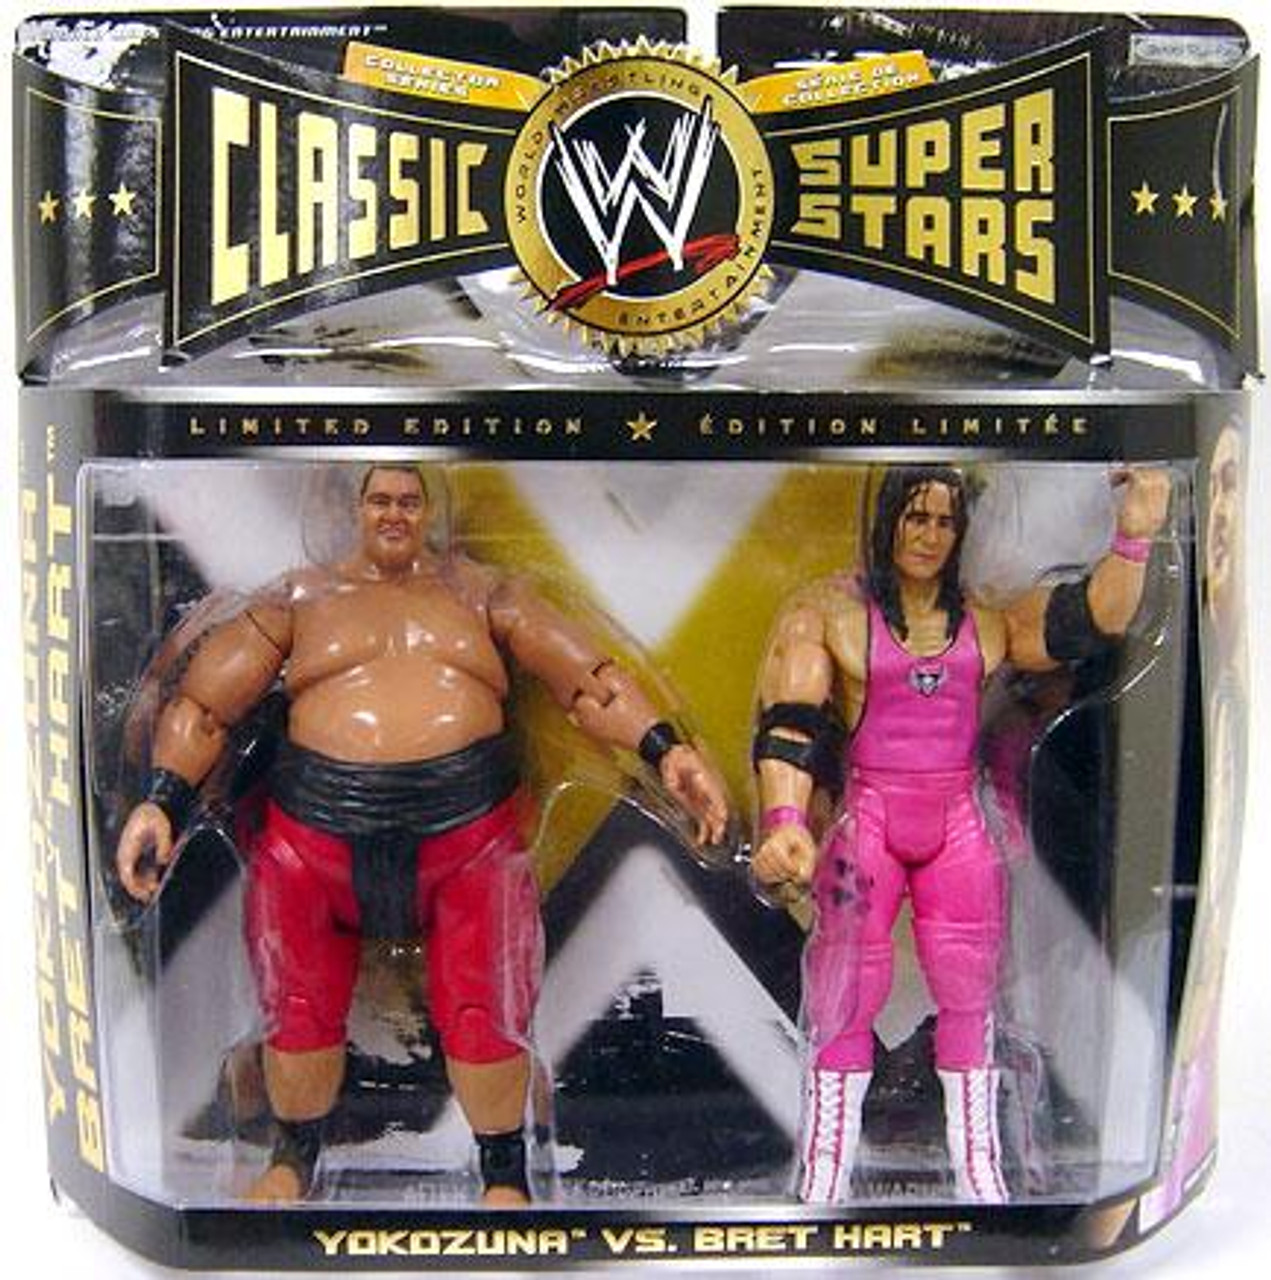 WWE Wrestling Classic Superstars Yokozuna vs. Bret Hart Action Figure 2-Pack